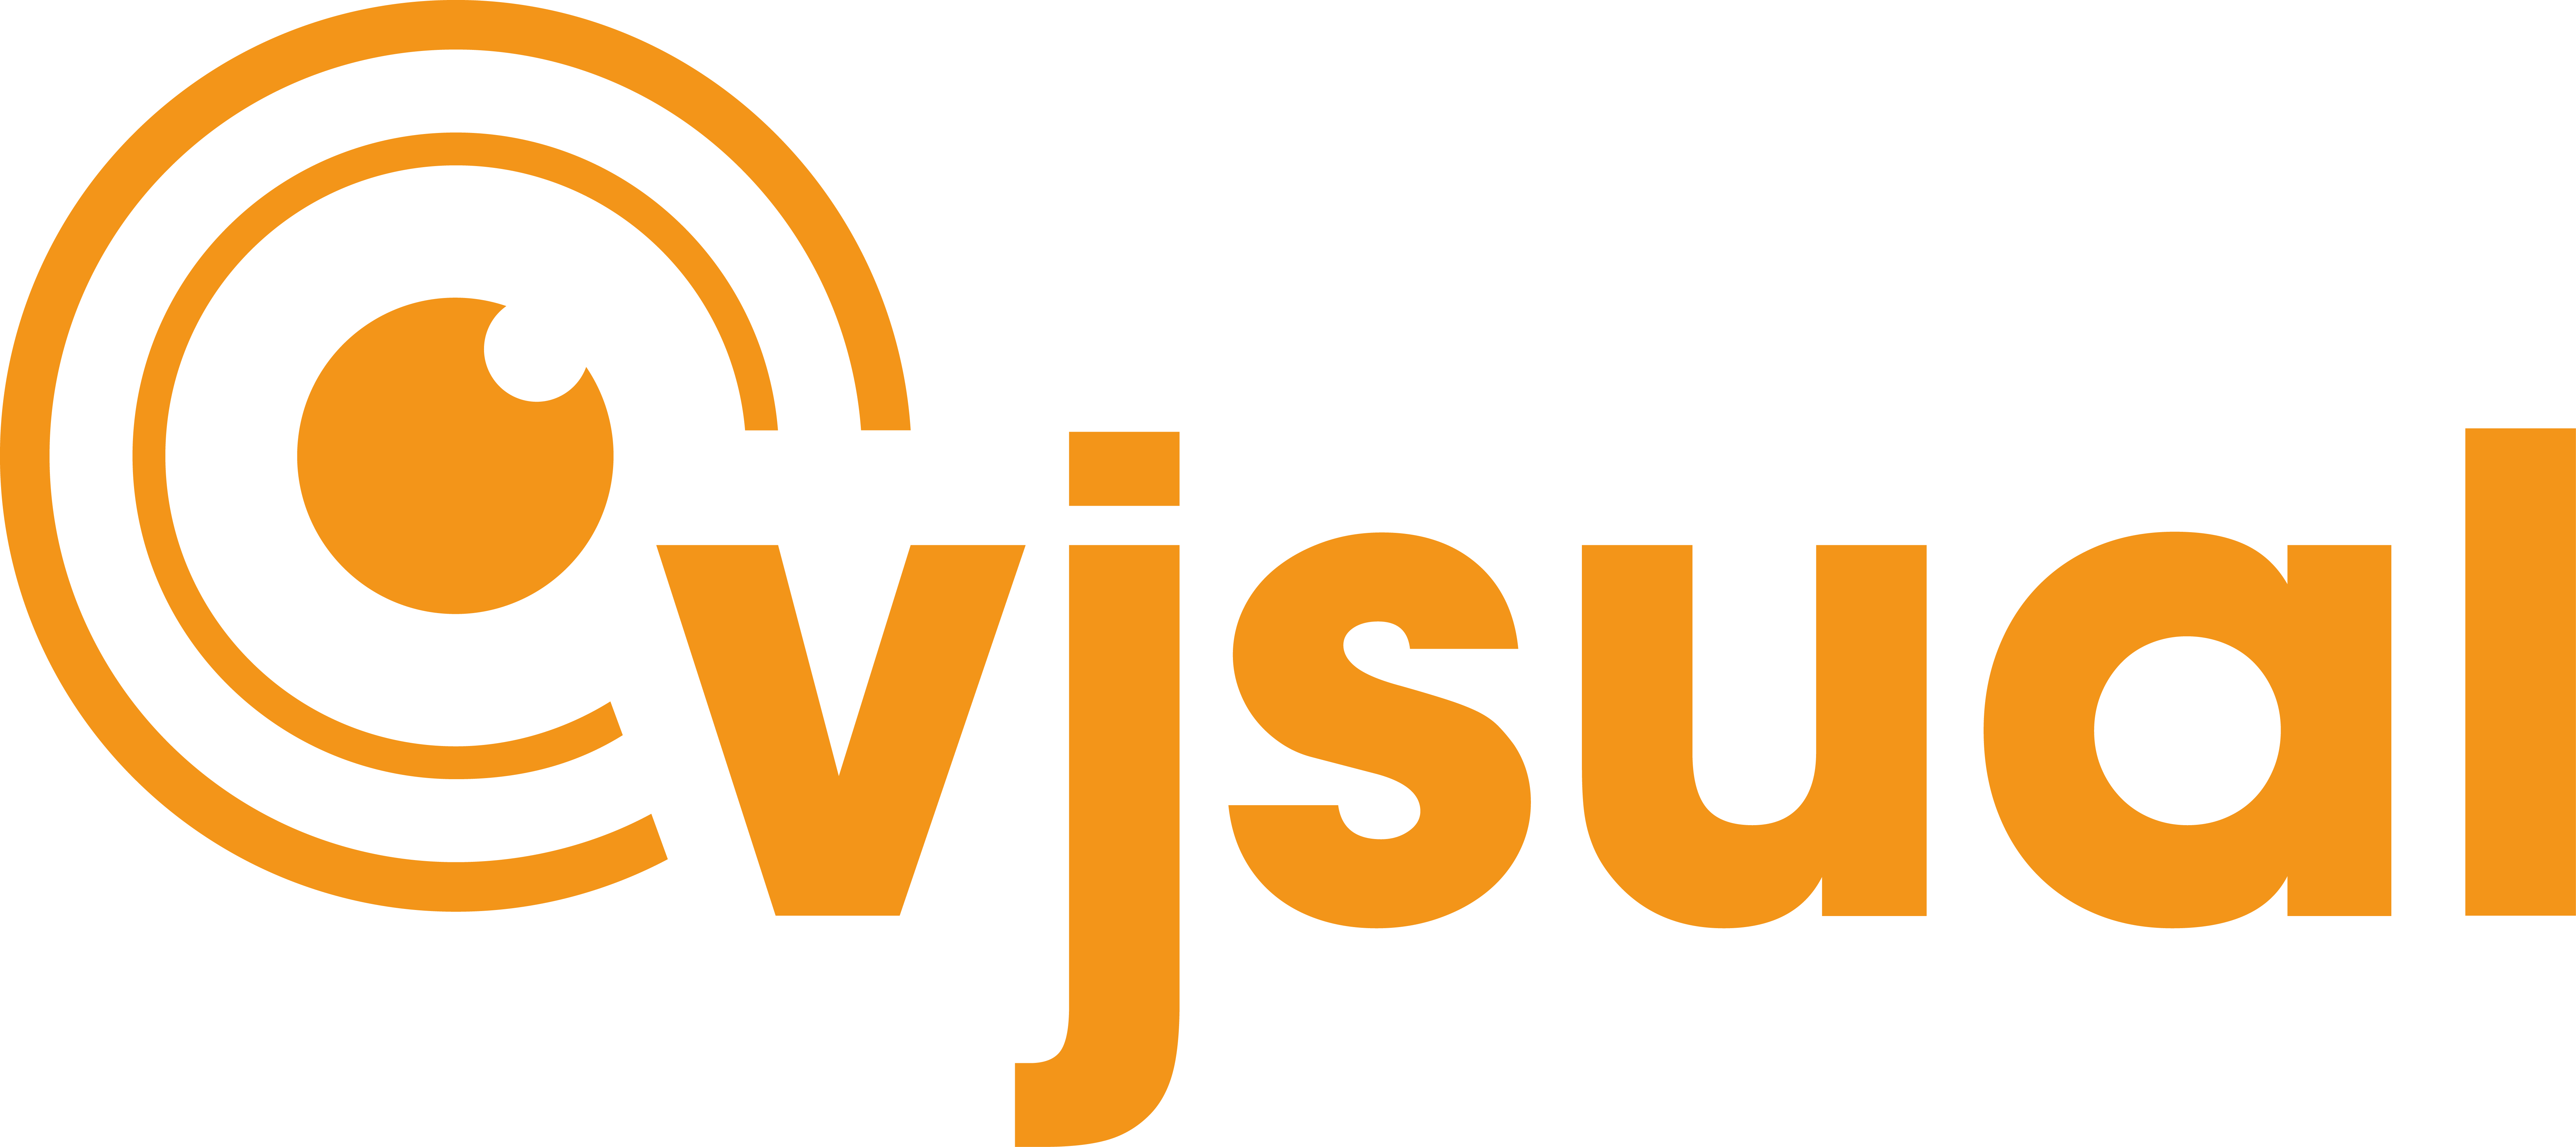 vjsual | YYM Media Solutions GmbH